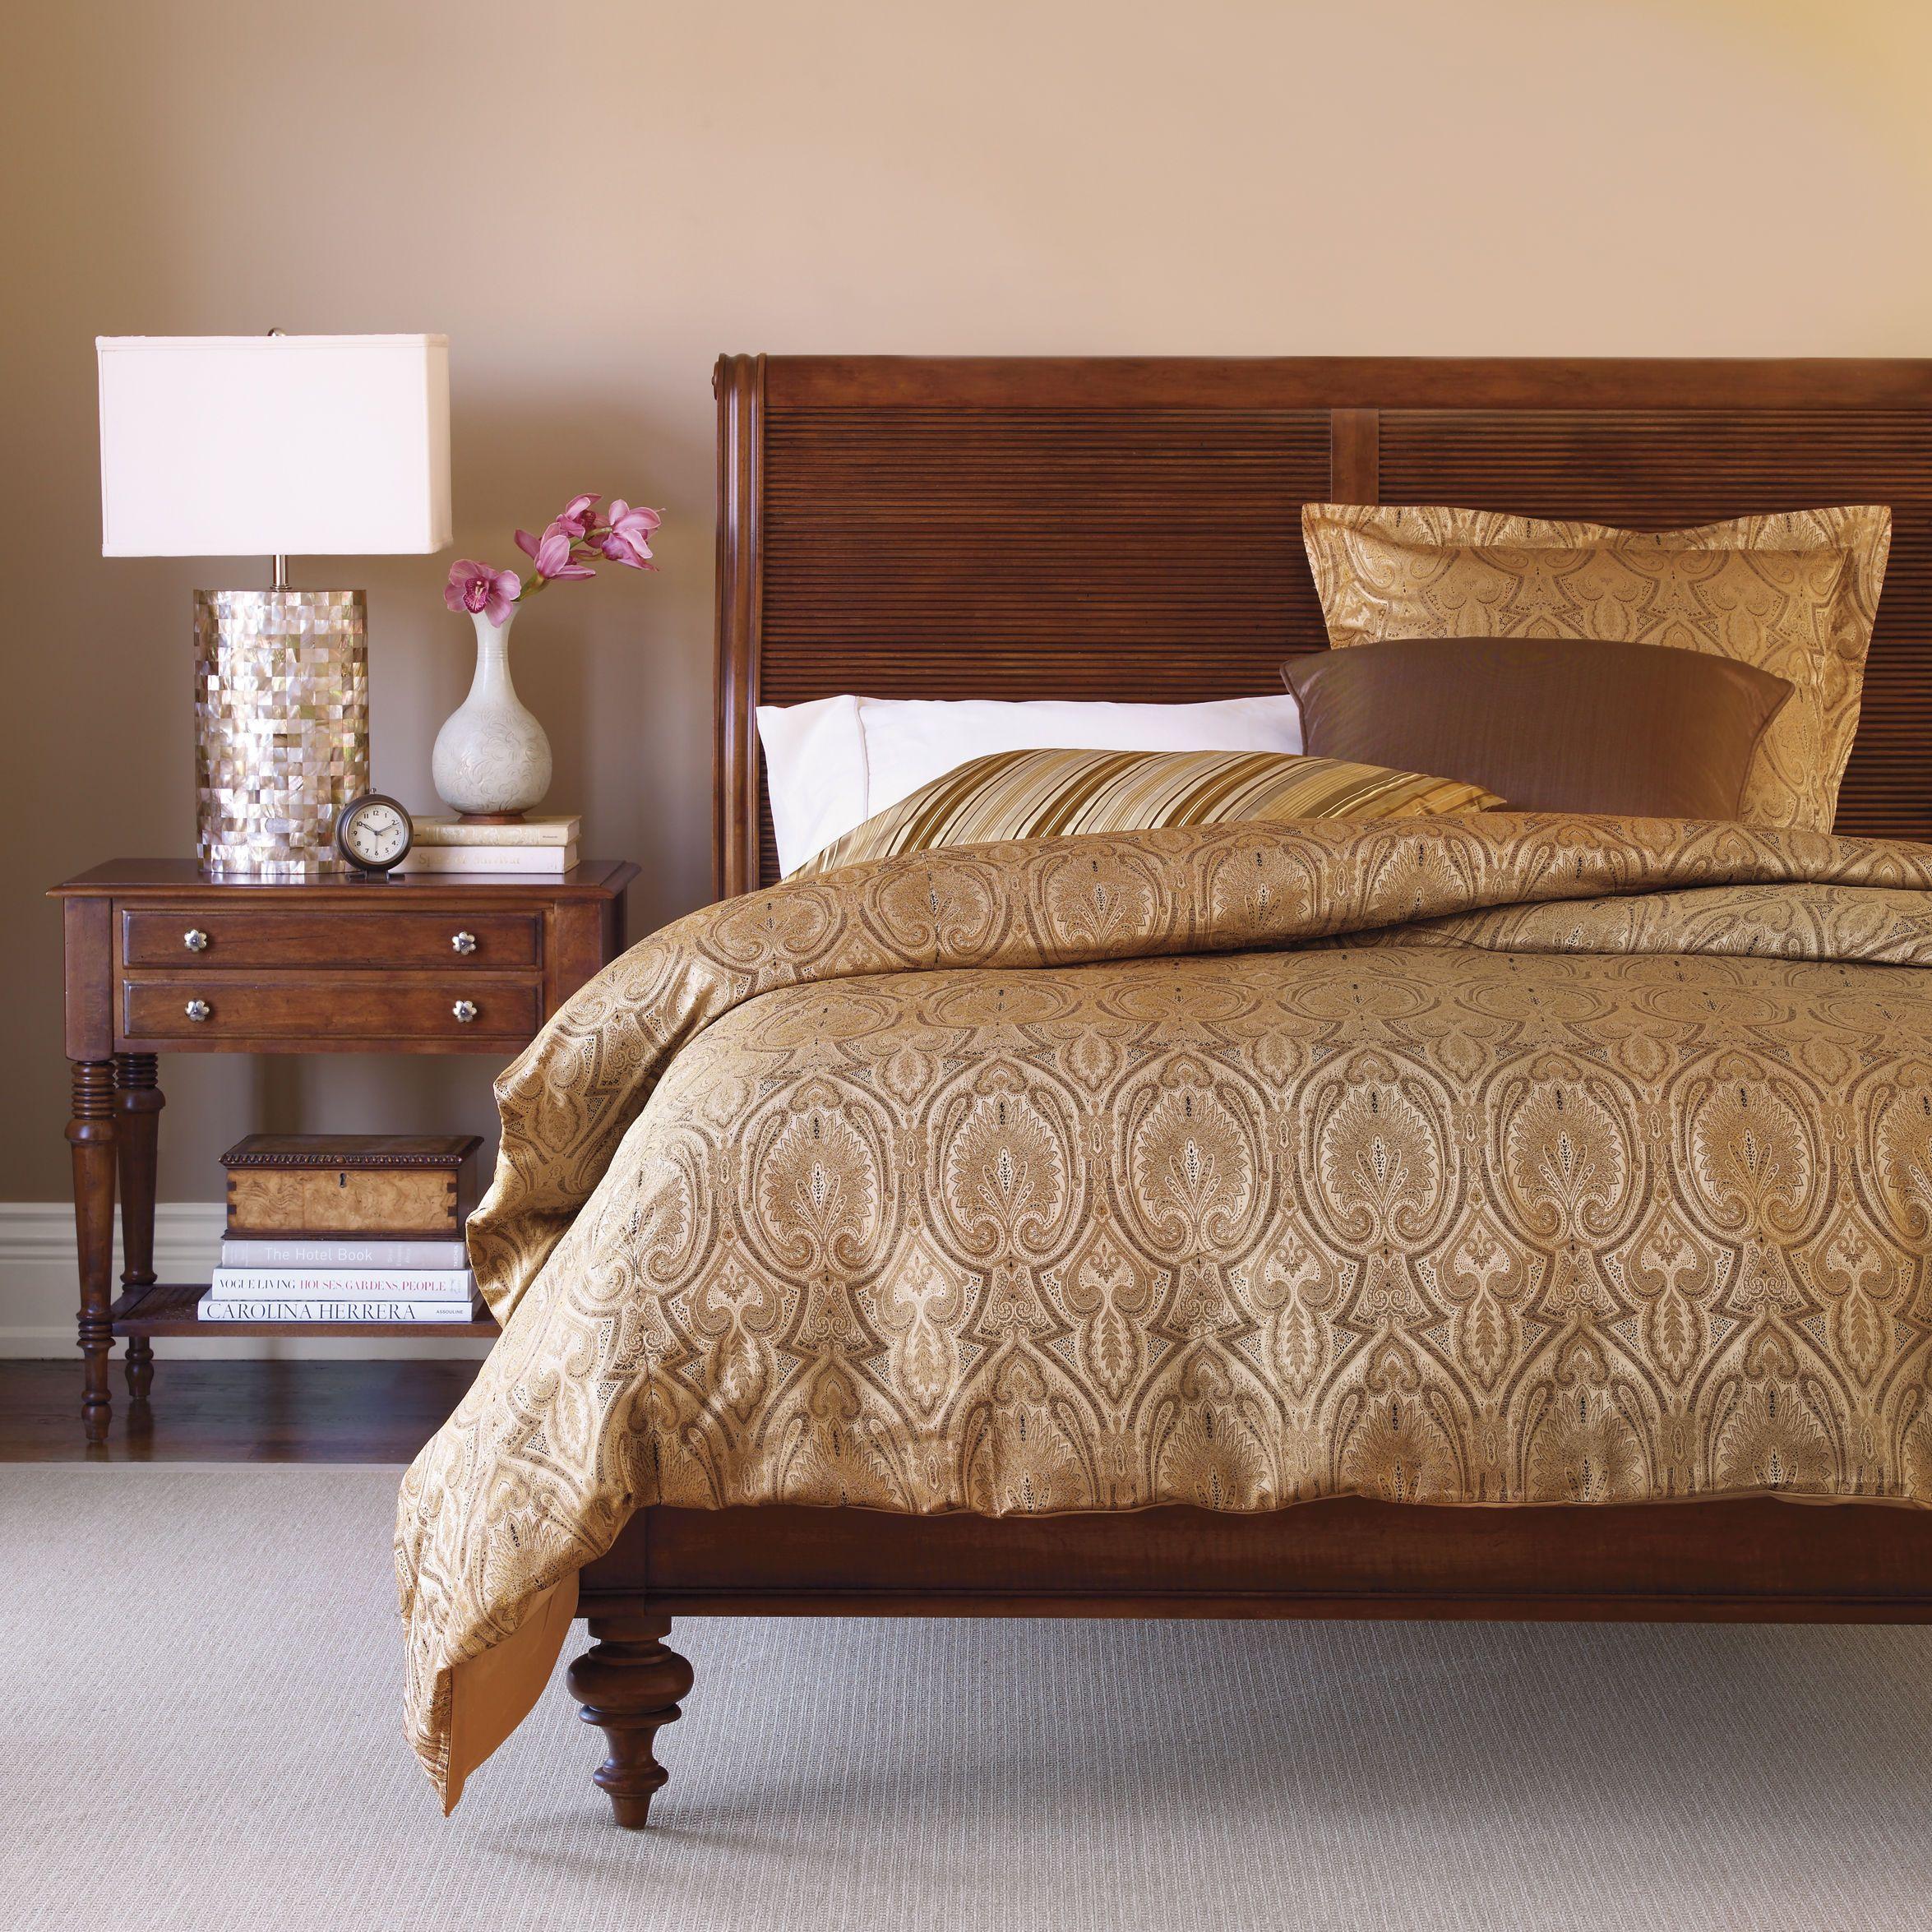 Cayman Bed Ethan Allen US Home decor